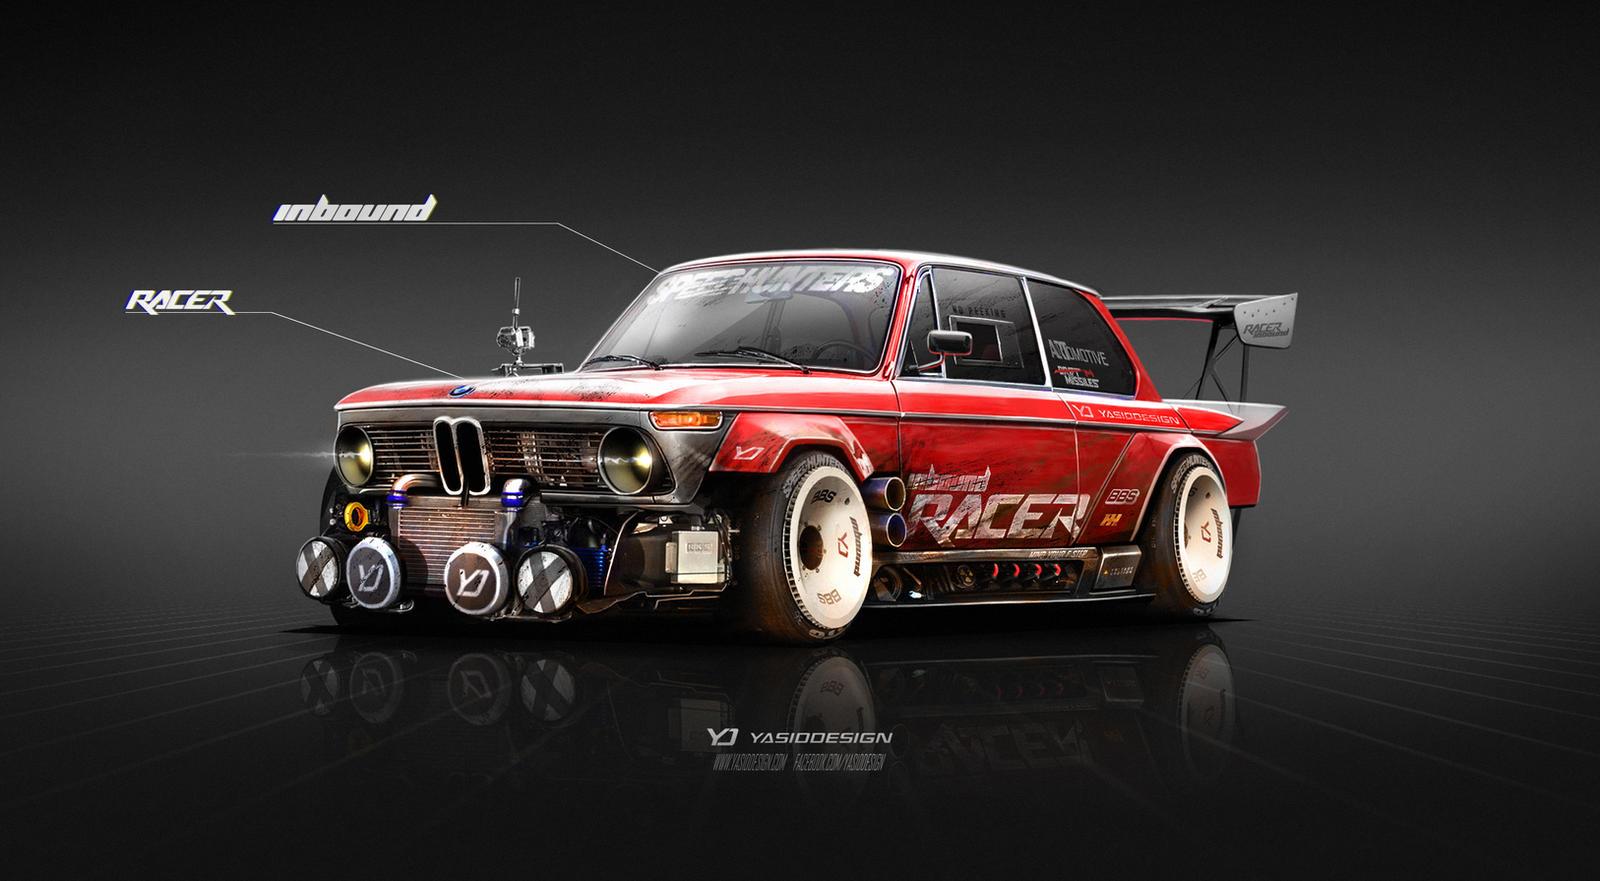 Bmw 2002 Tii Race Car >> 1974 BMW 2002 Inbound Racer by yasiddesign on DeviantArt